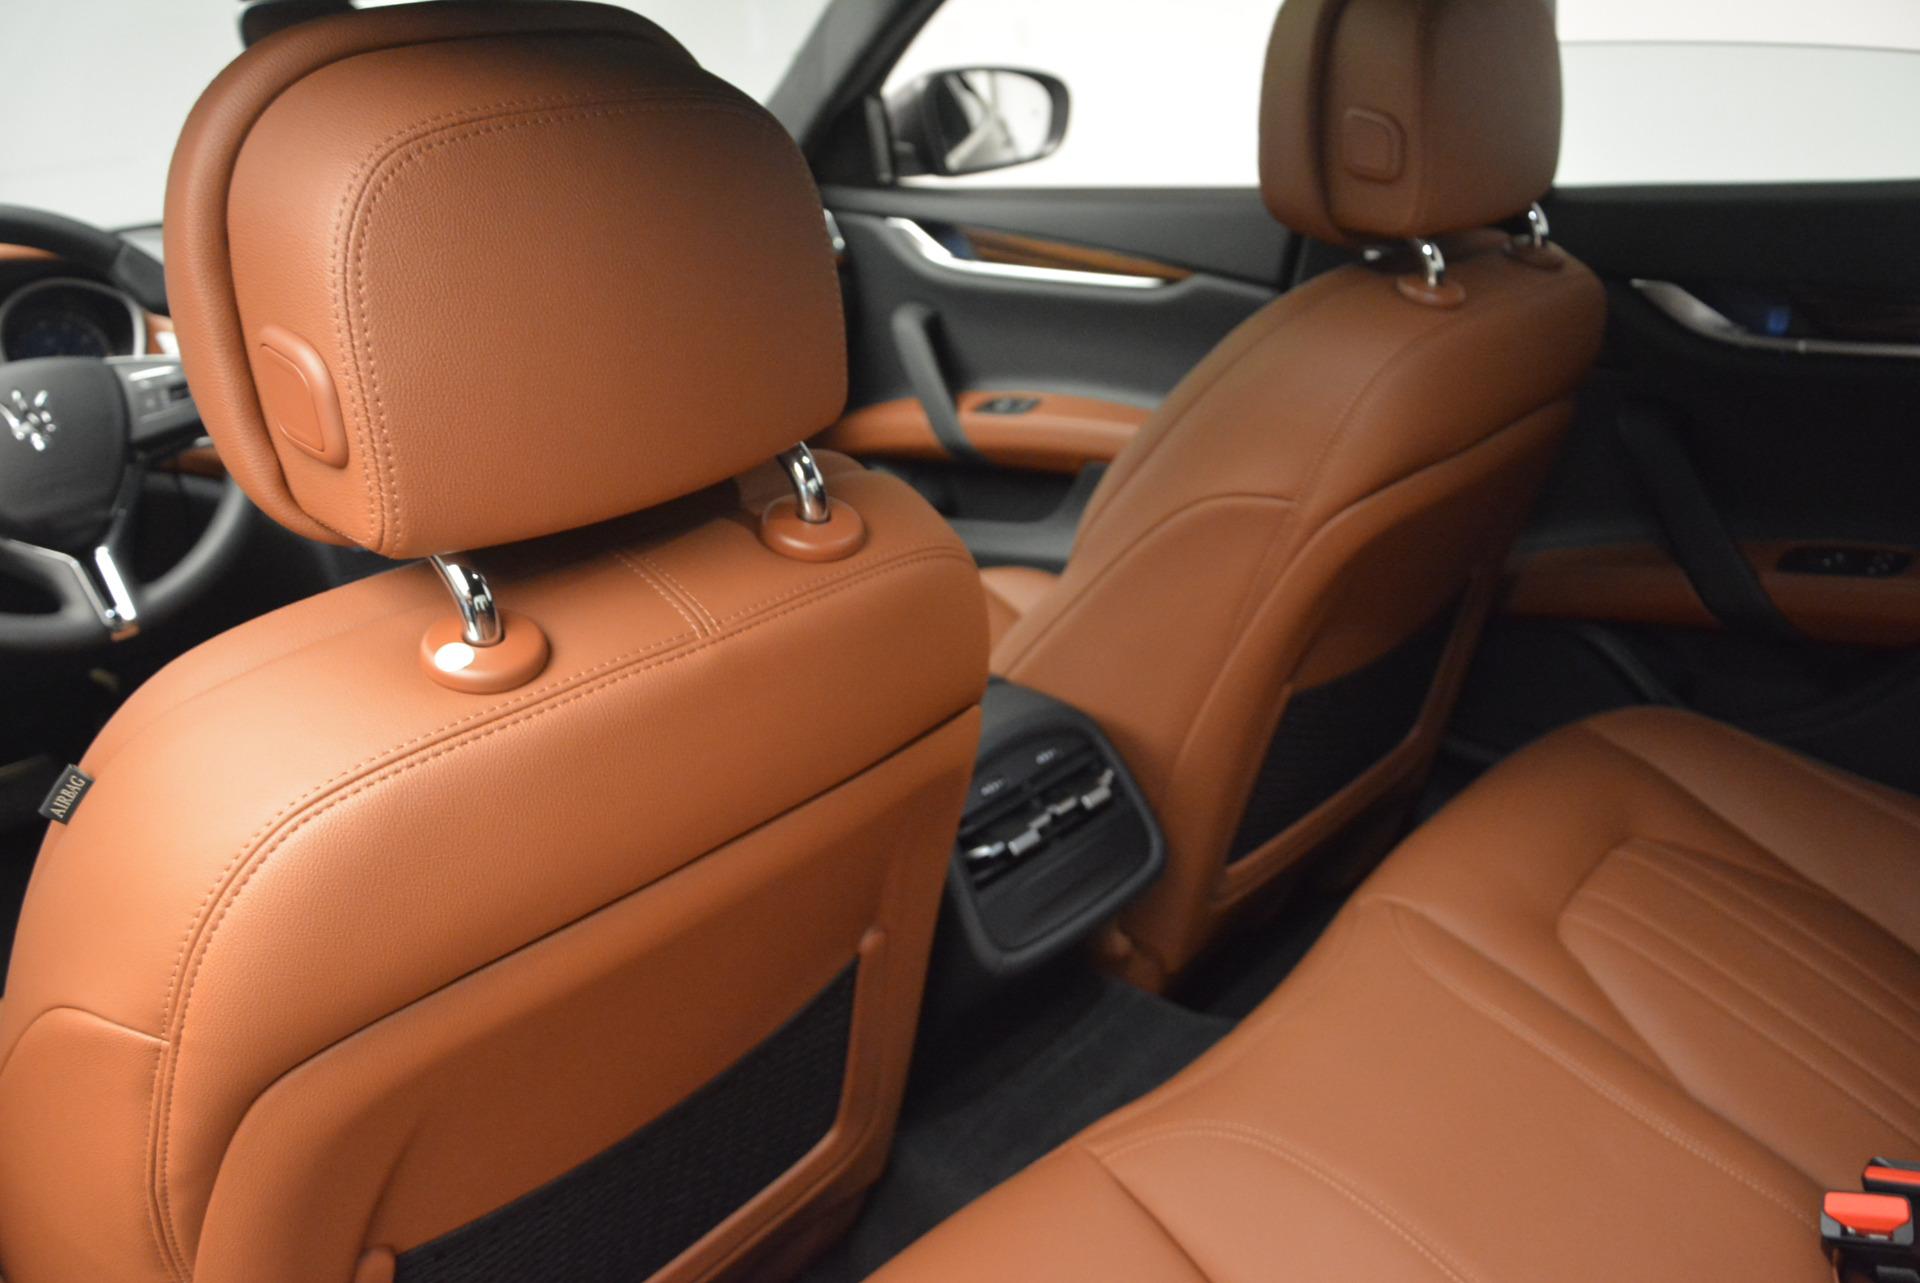 Used 2017 Maserati Ghibli S Q4  EX-LOANER For Sale In Westport, CT 565_p16